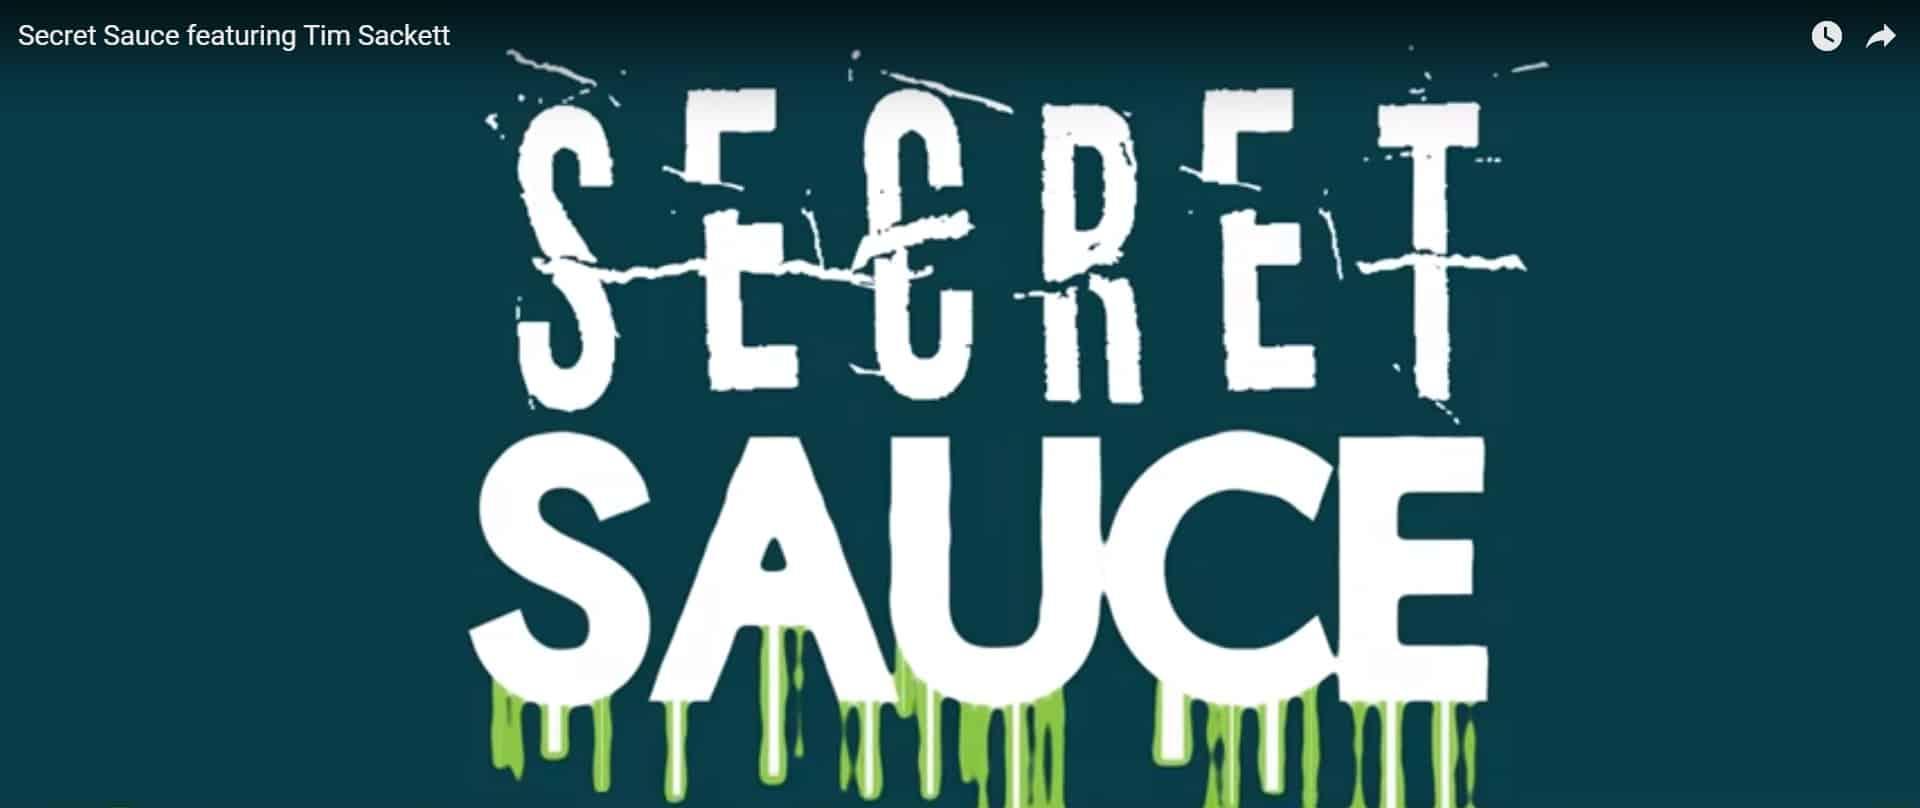 FoT secret sauce blog header